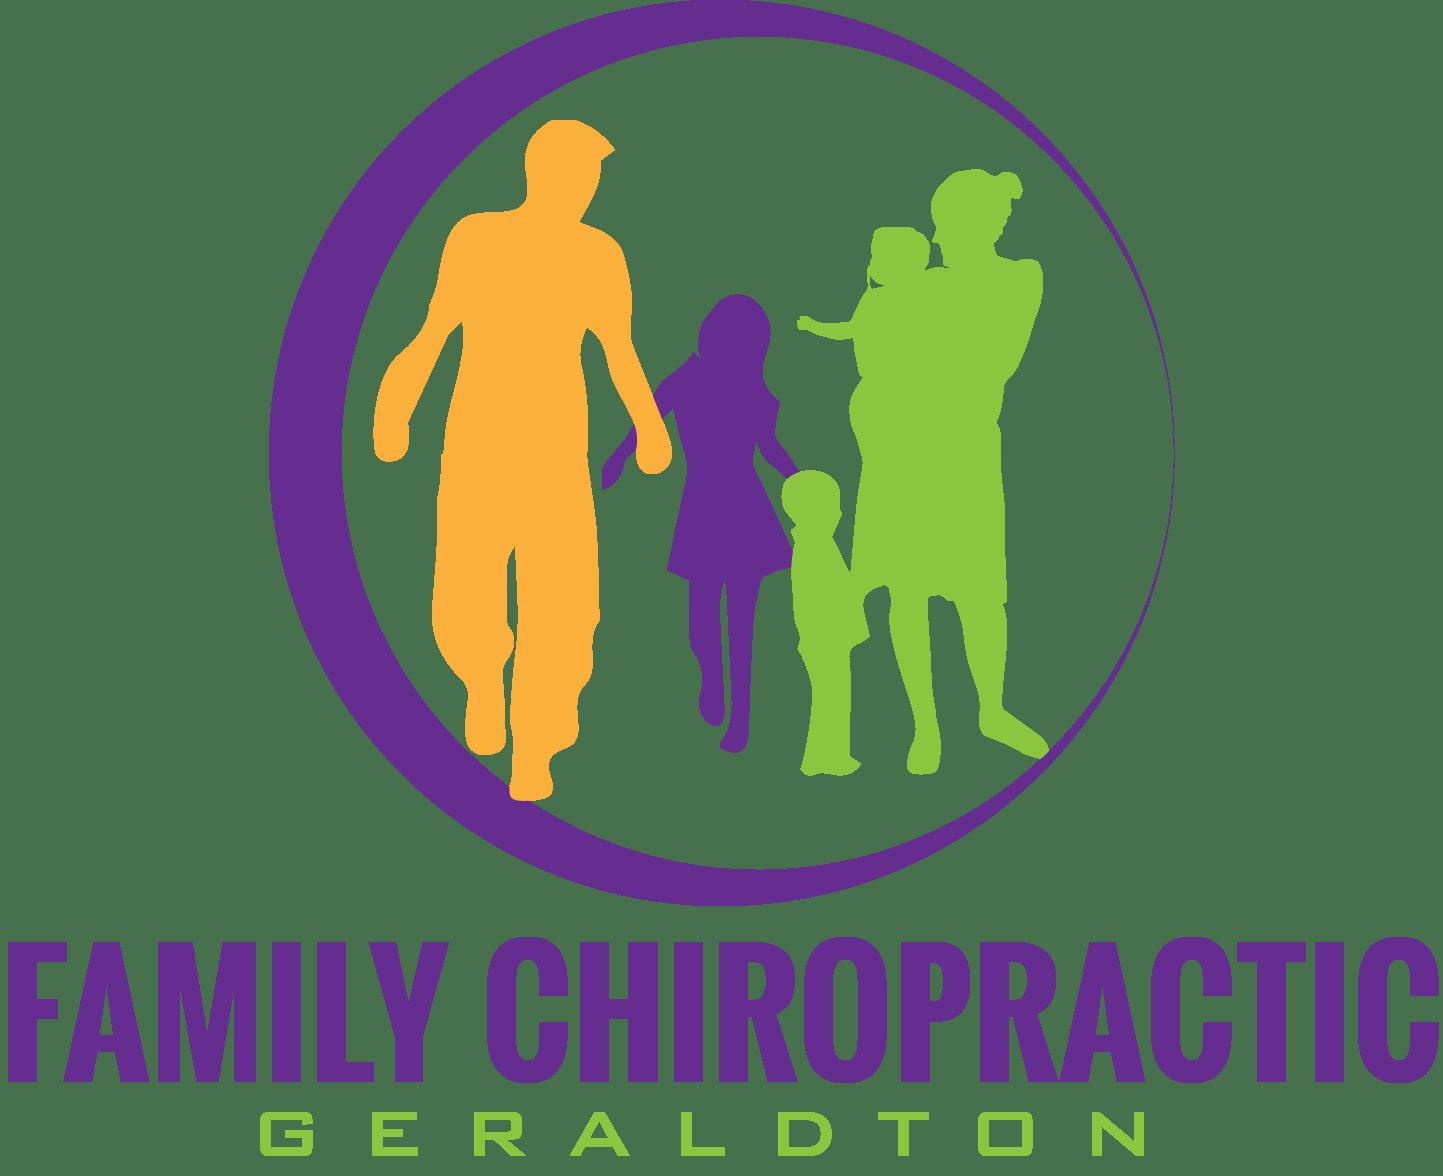 Family Chiropractic Geraldton Logo